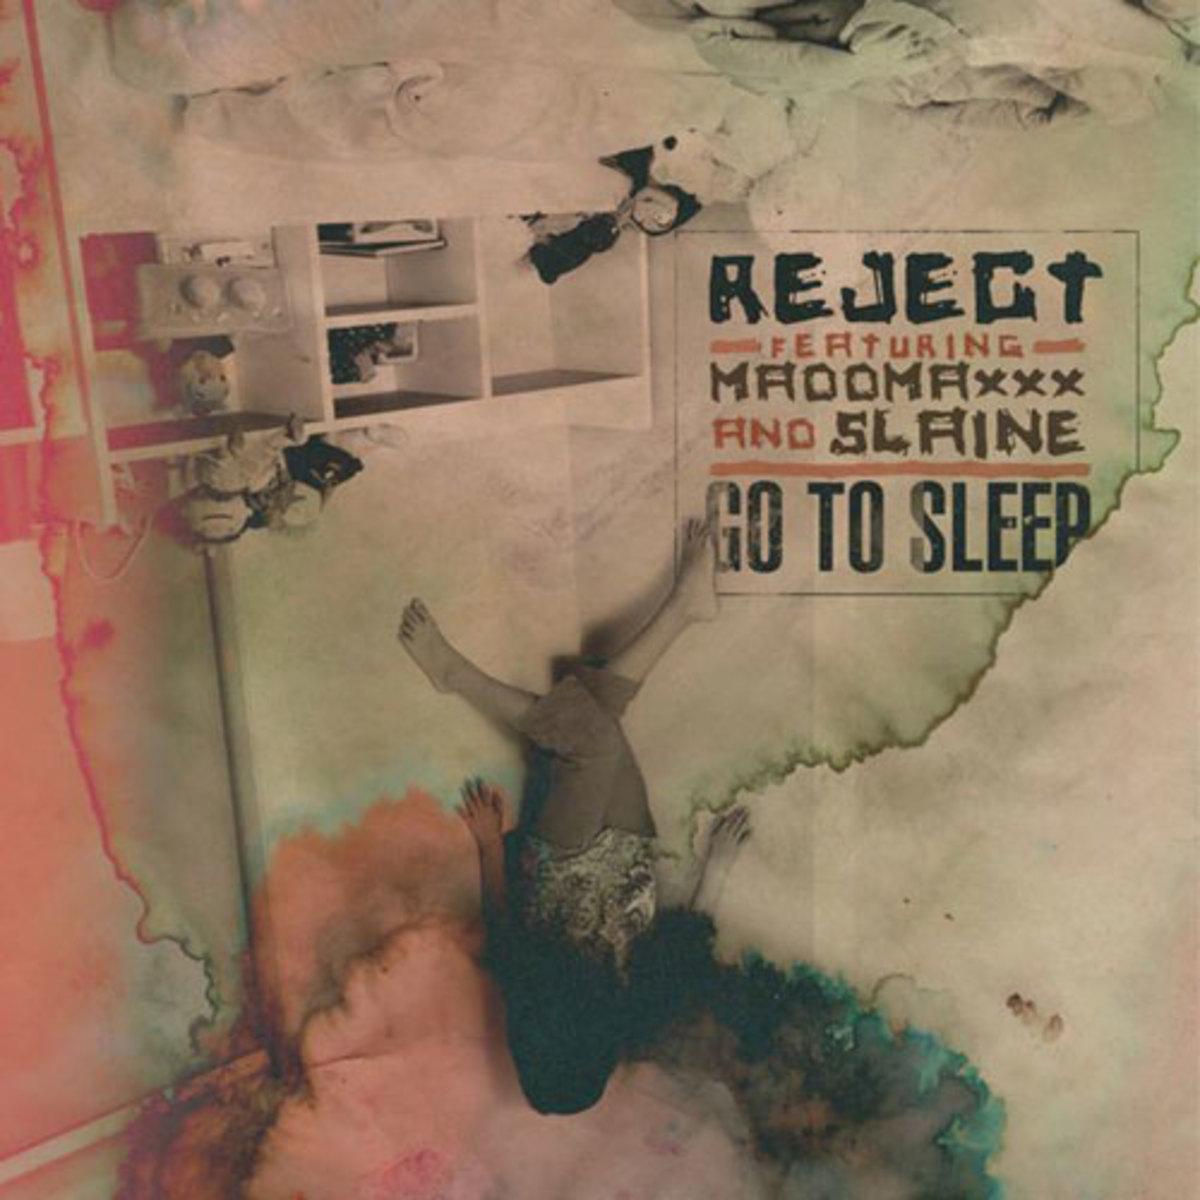 reject-gotosleep.jpg